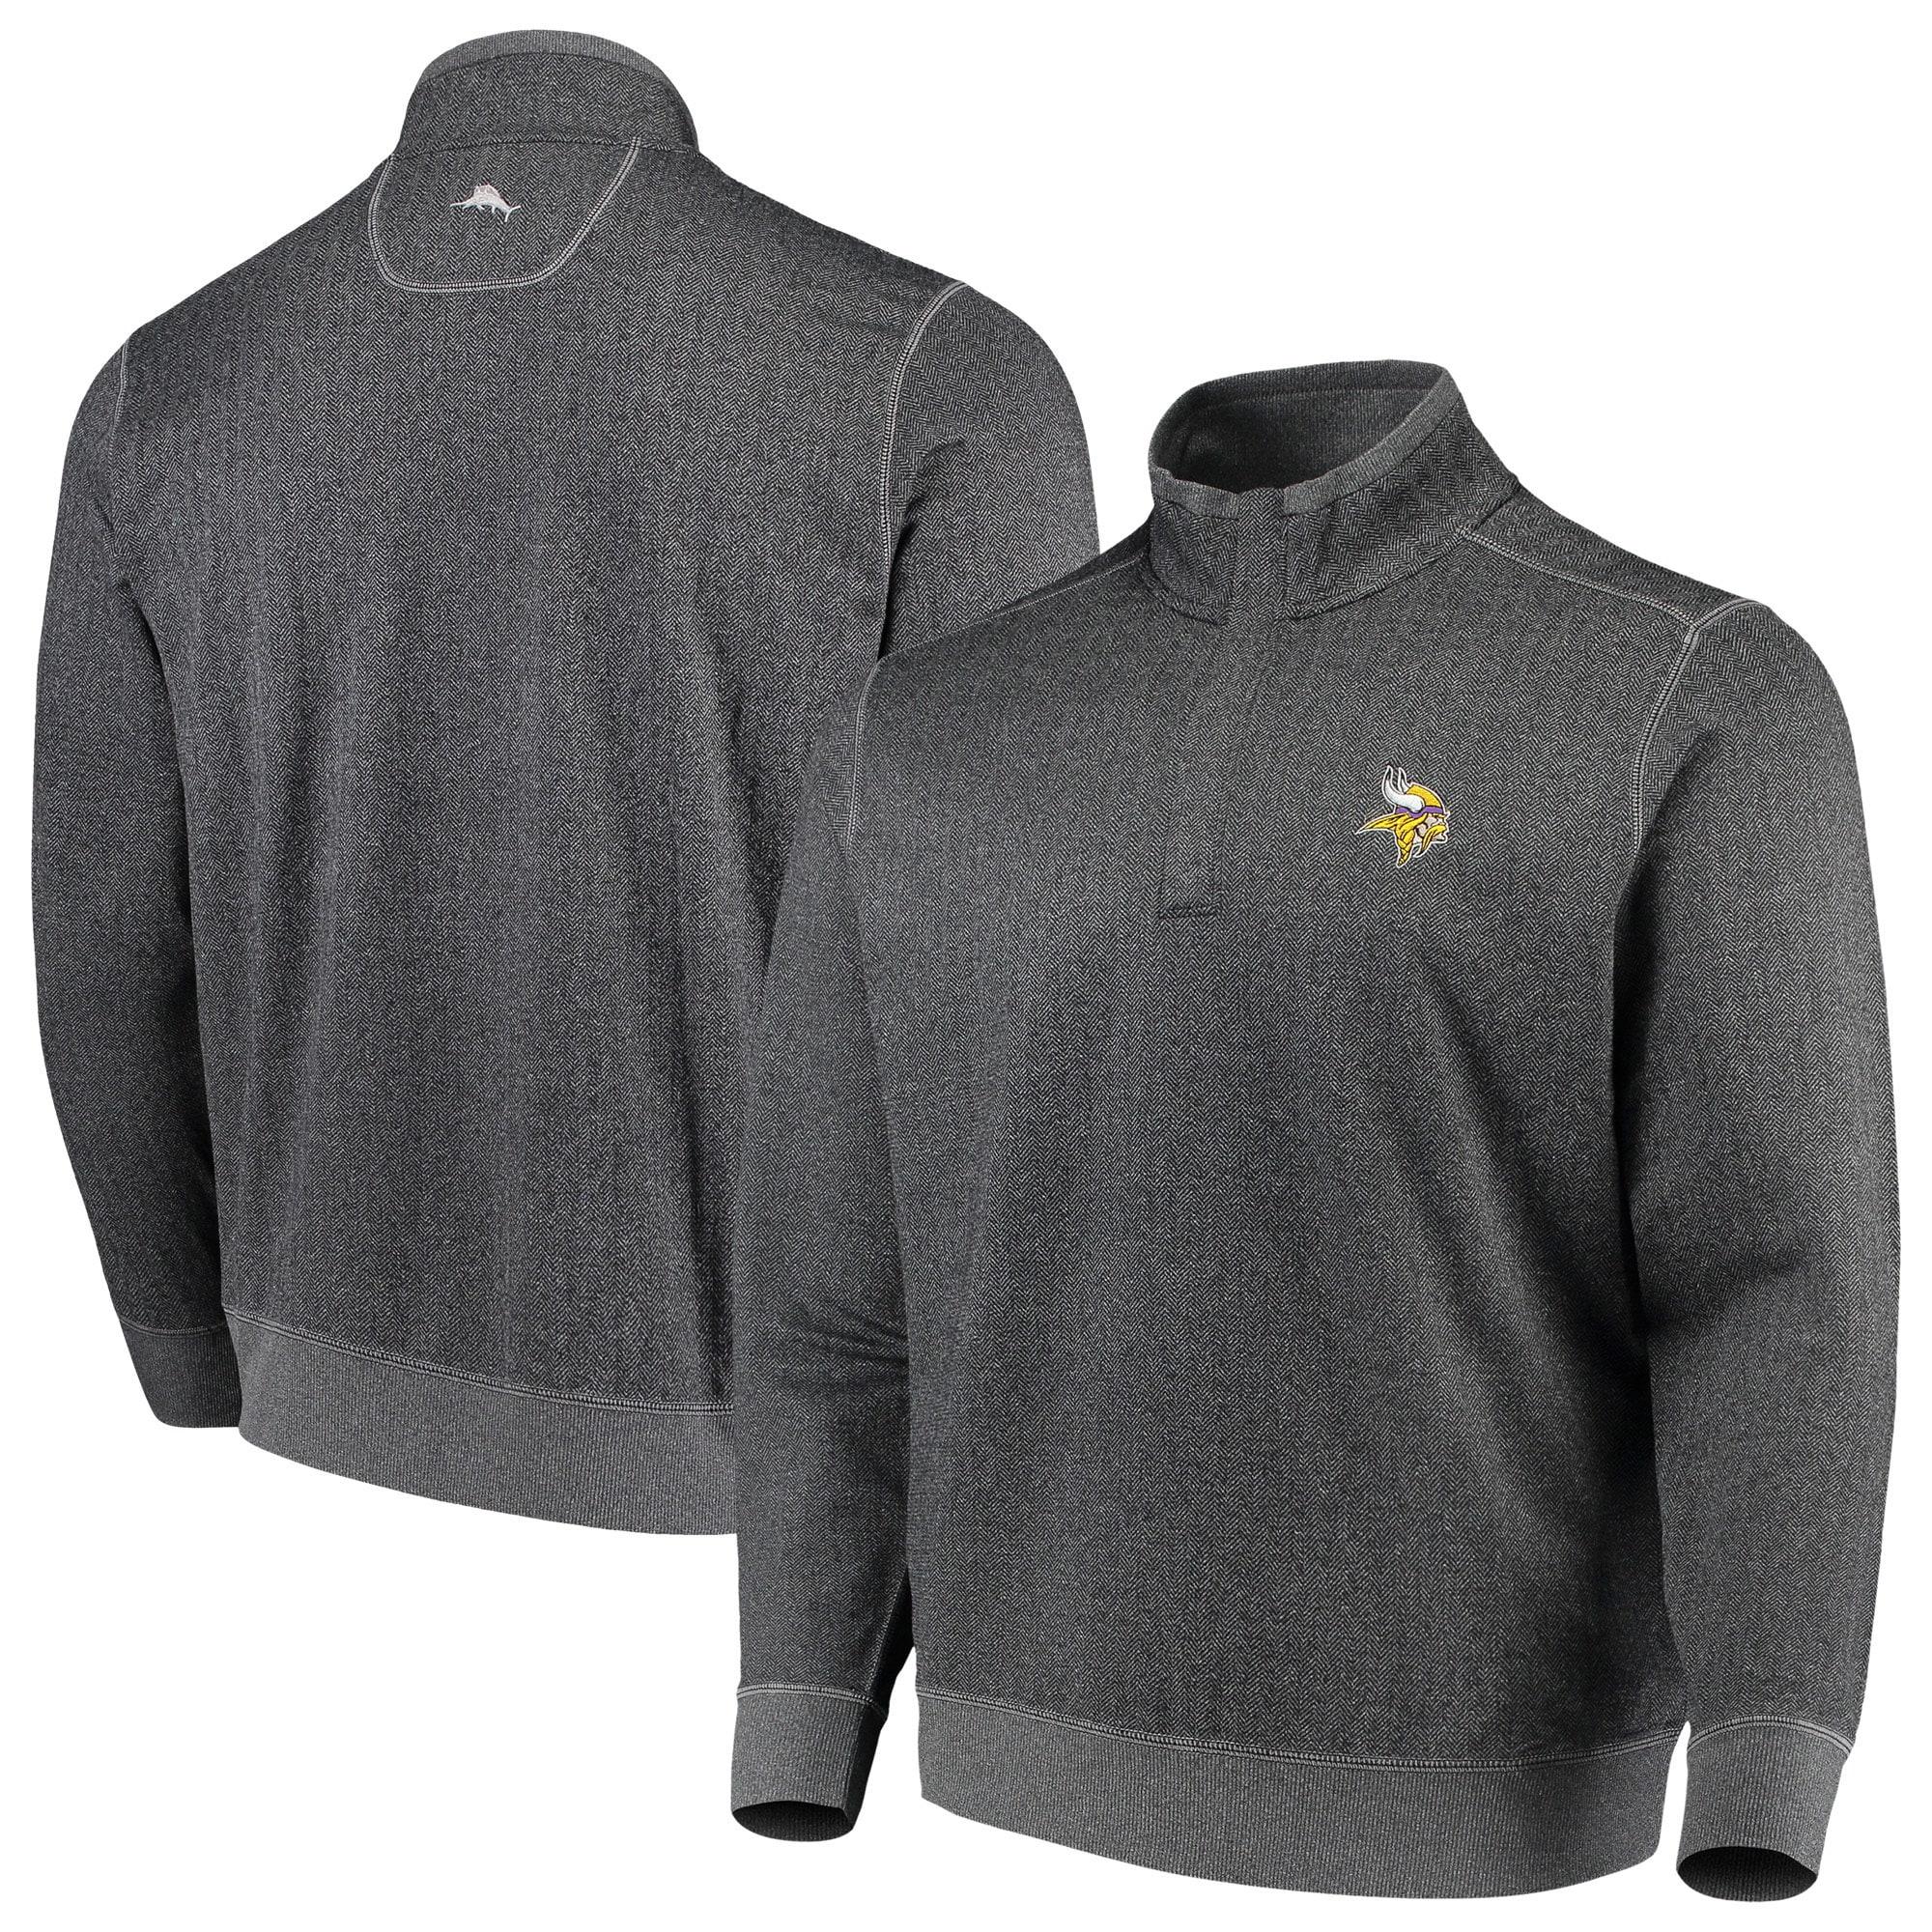 Minnesota Vikings Tommy Bahama ProFormance Half-Zip Pullover Jacket - Heathered Charcoal